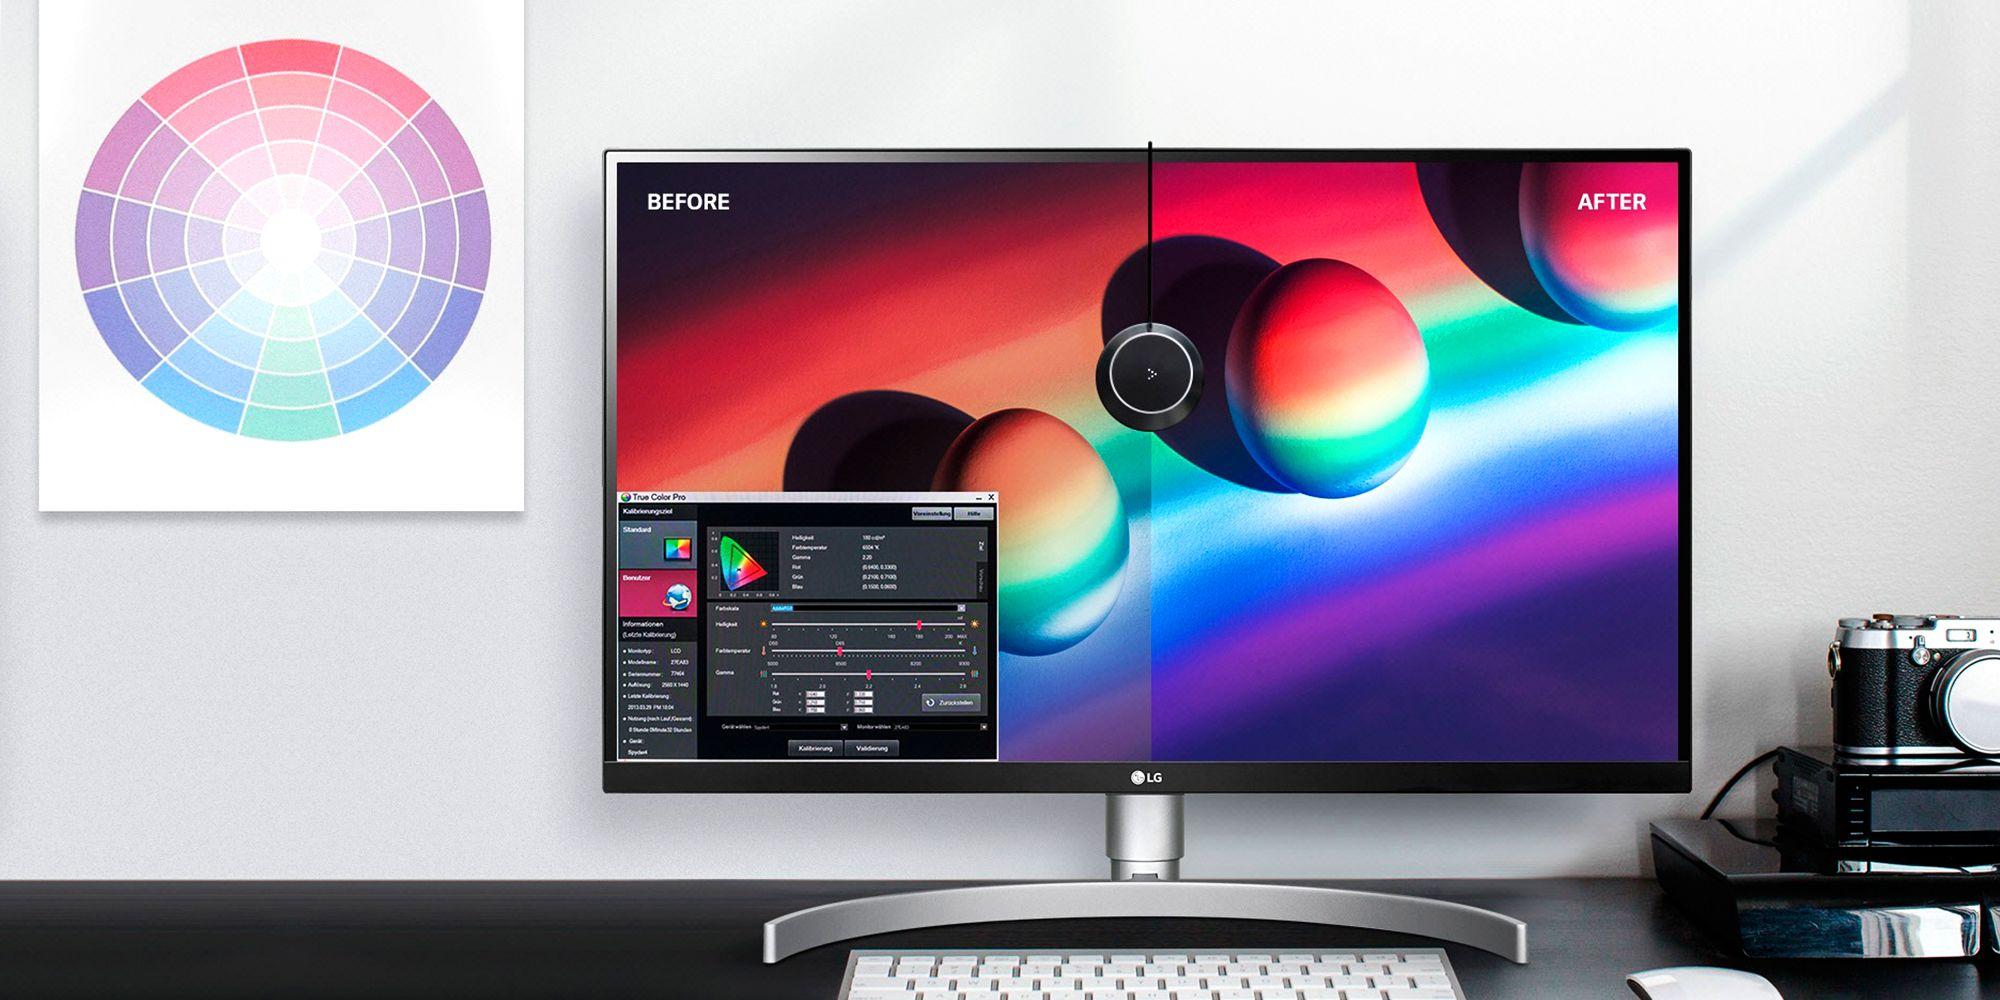 10 Best 4K Monitors of 2018 - Sleek 4K Monitors At Every Price